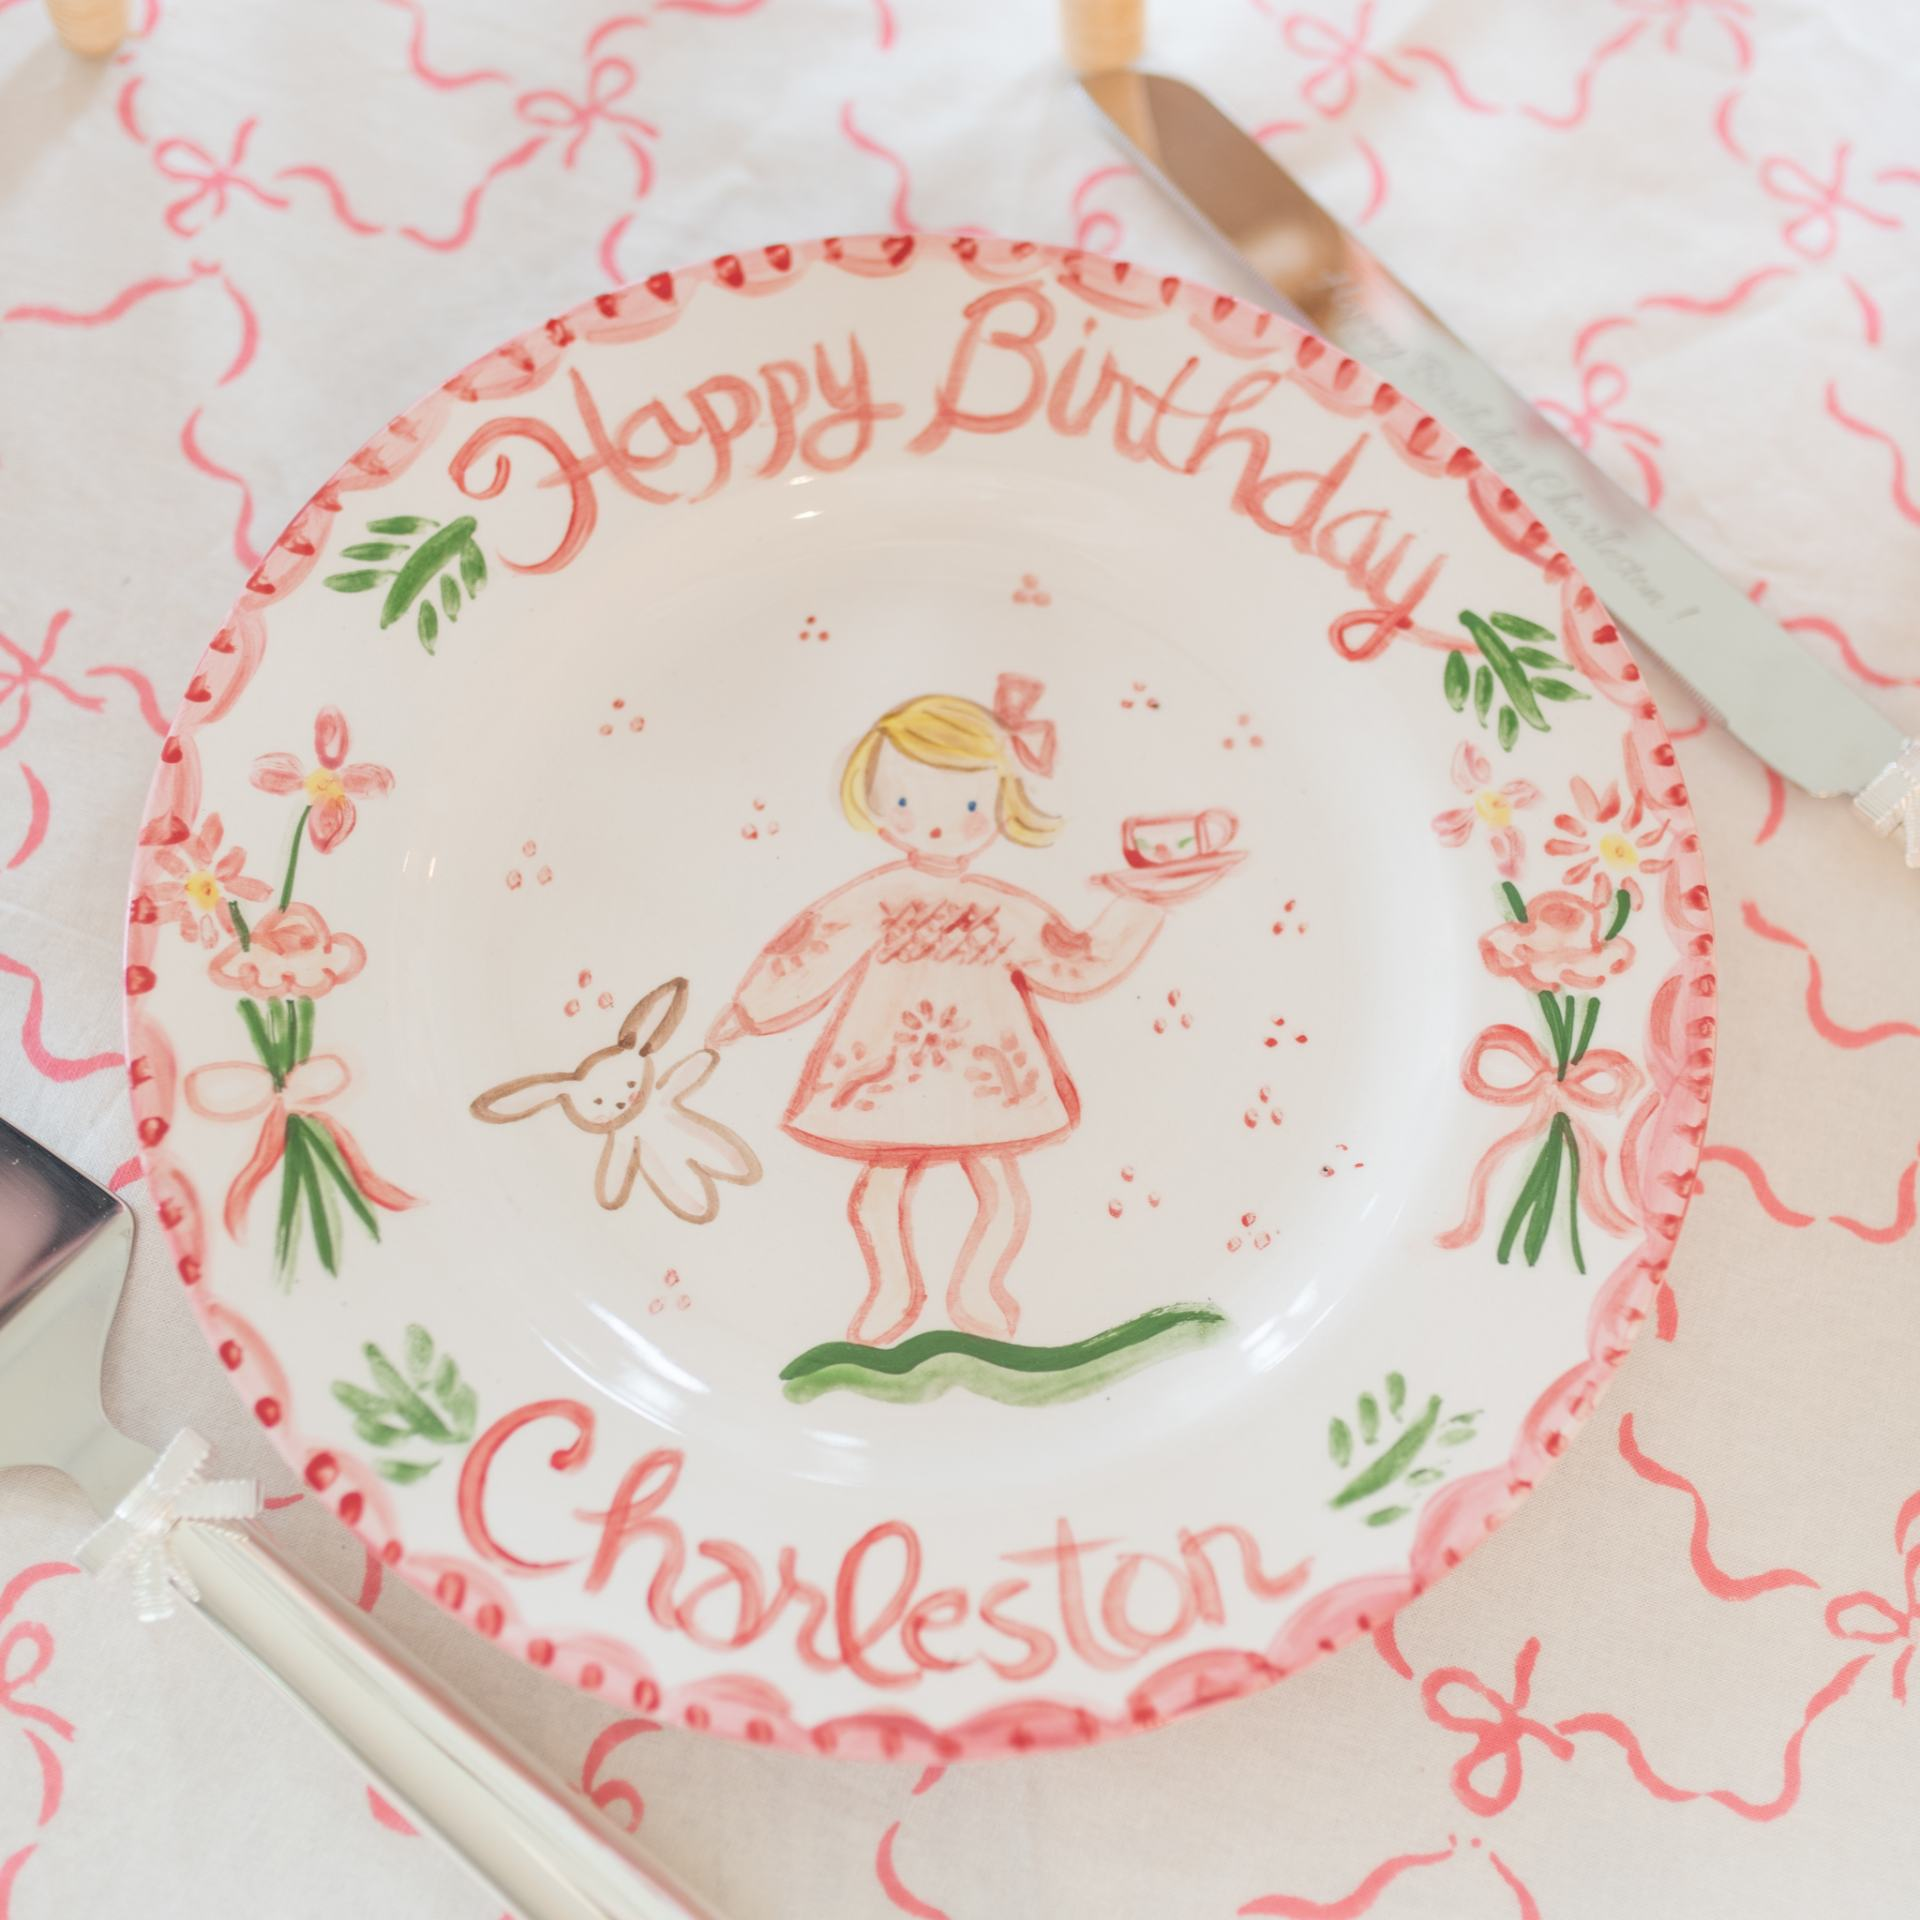 Tricia Lowenfield Custom Plate